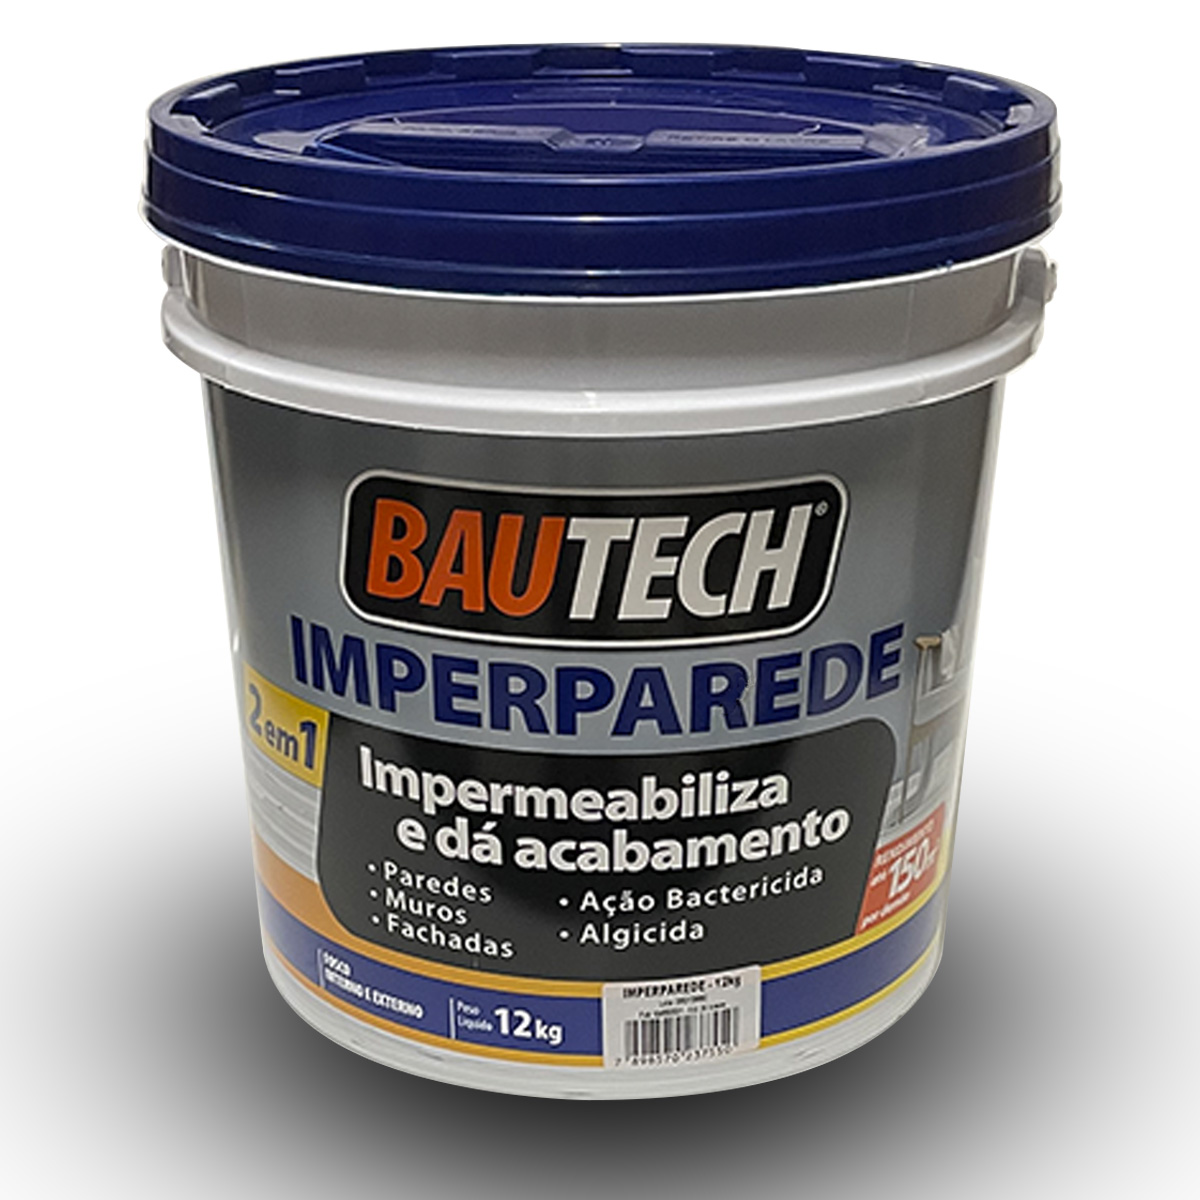 Tinta Impermeabilizante ImperParede Bautech Branco 12kg